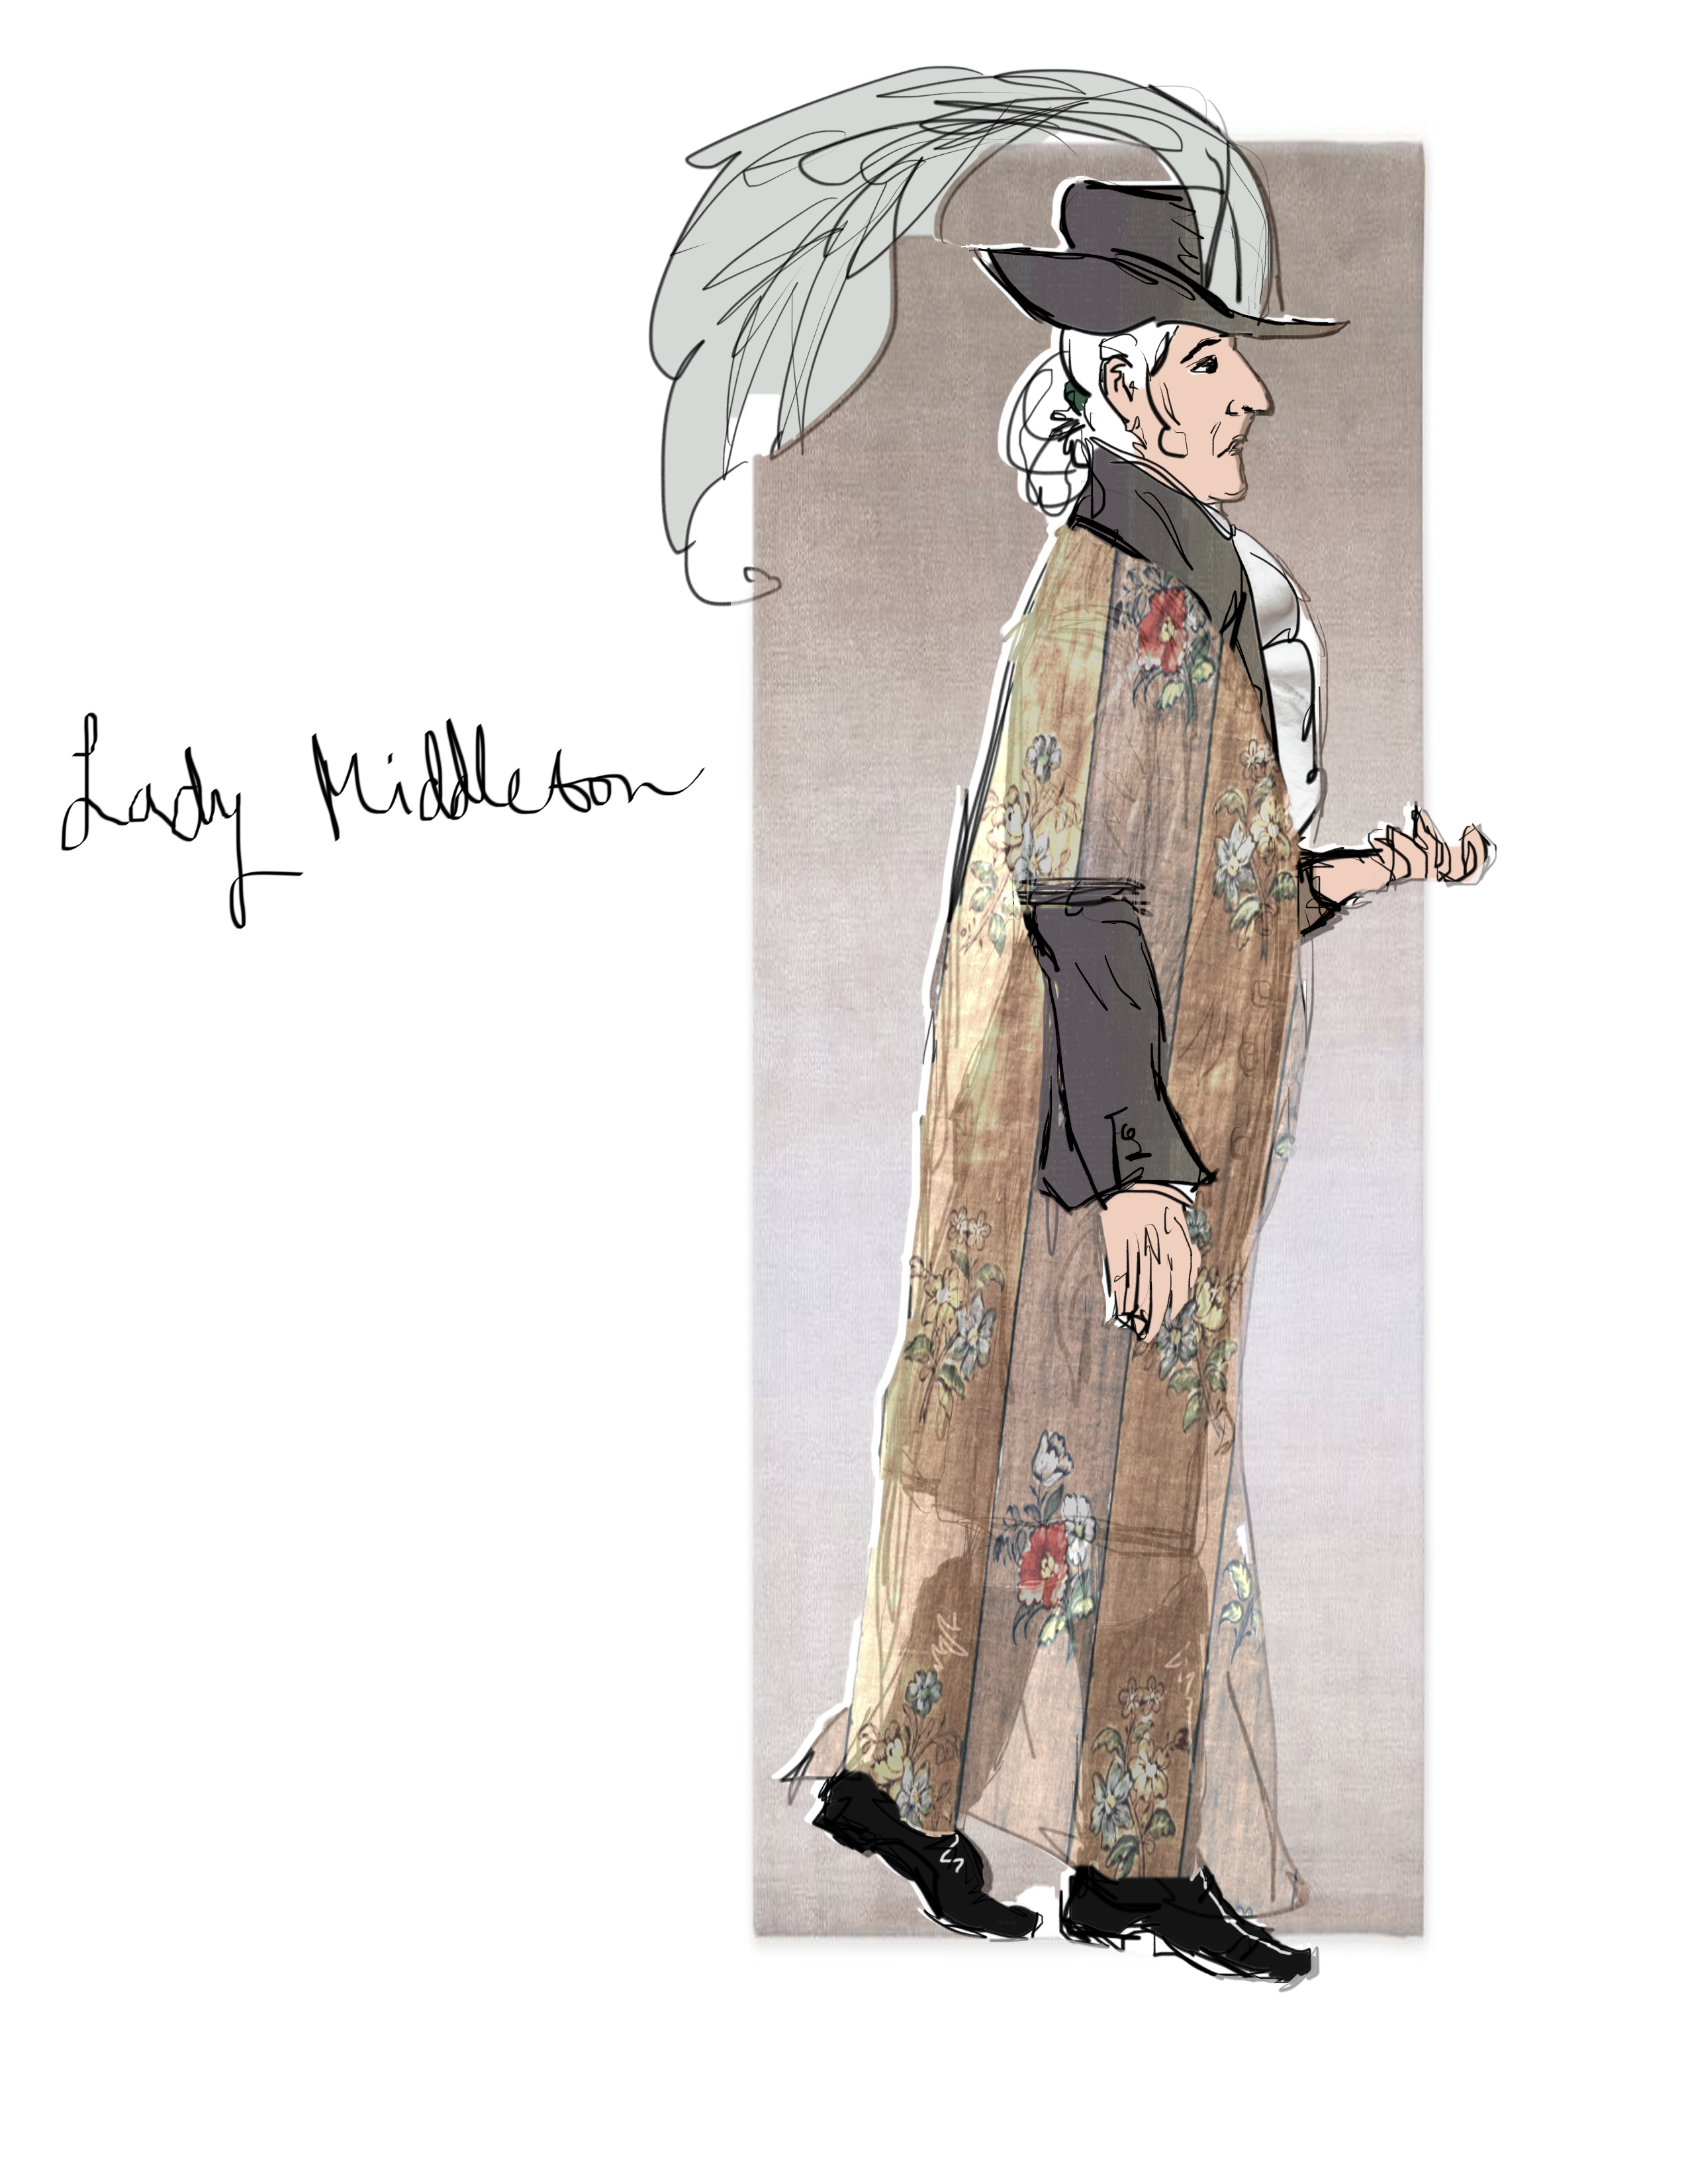 Lady Middleton